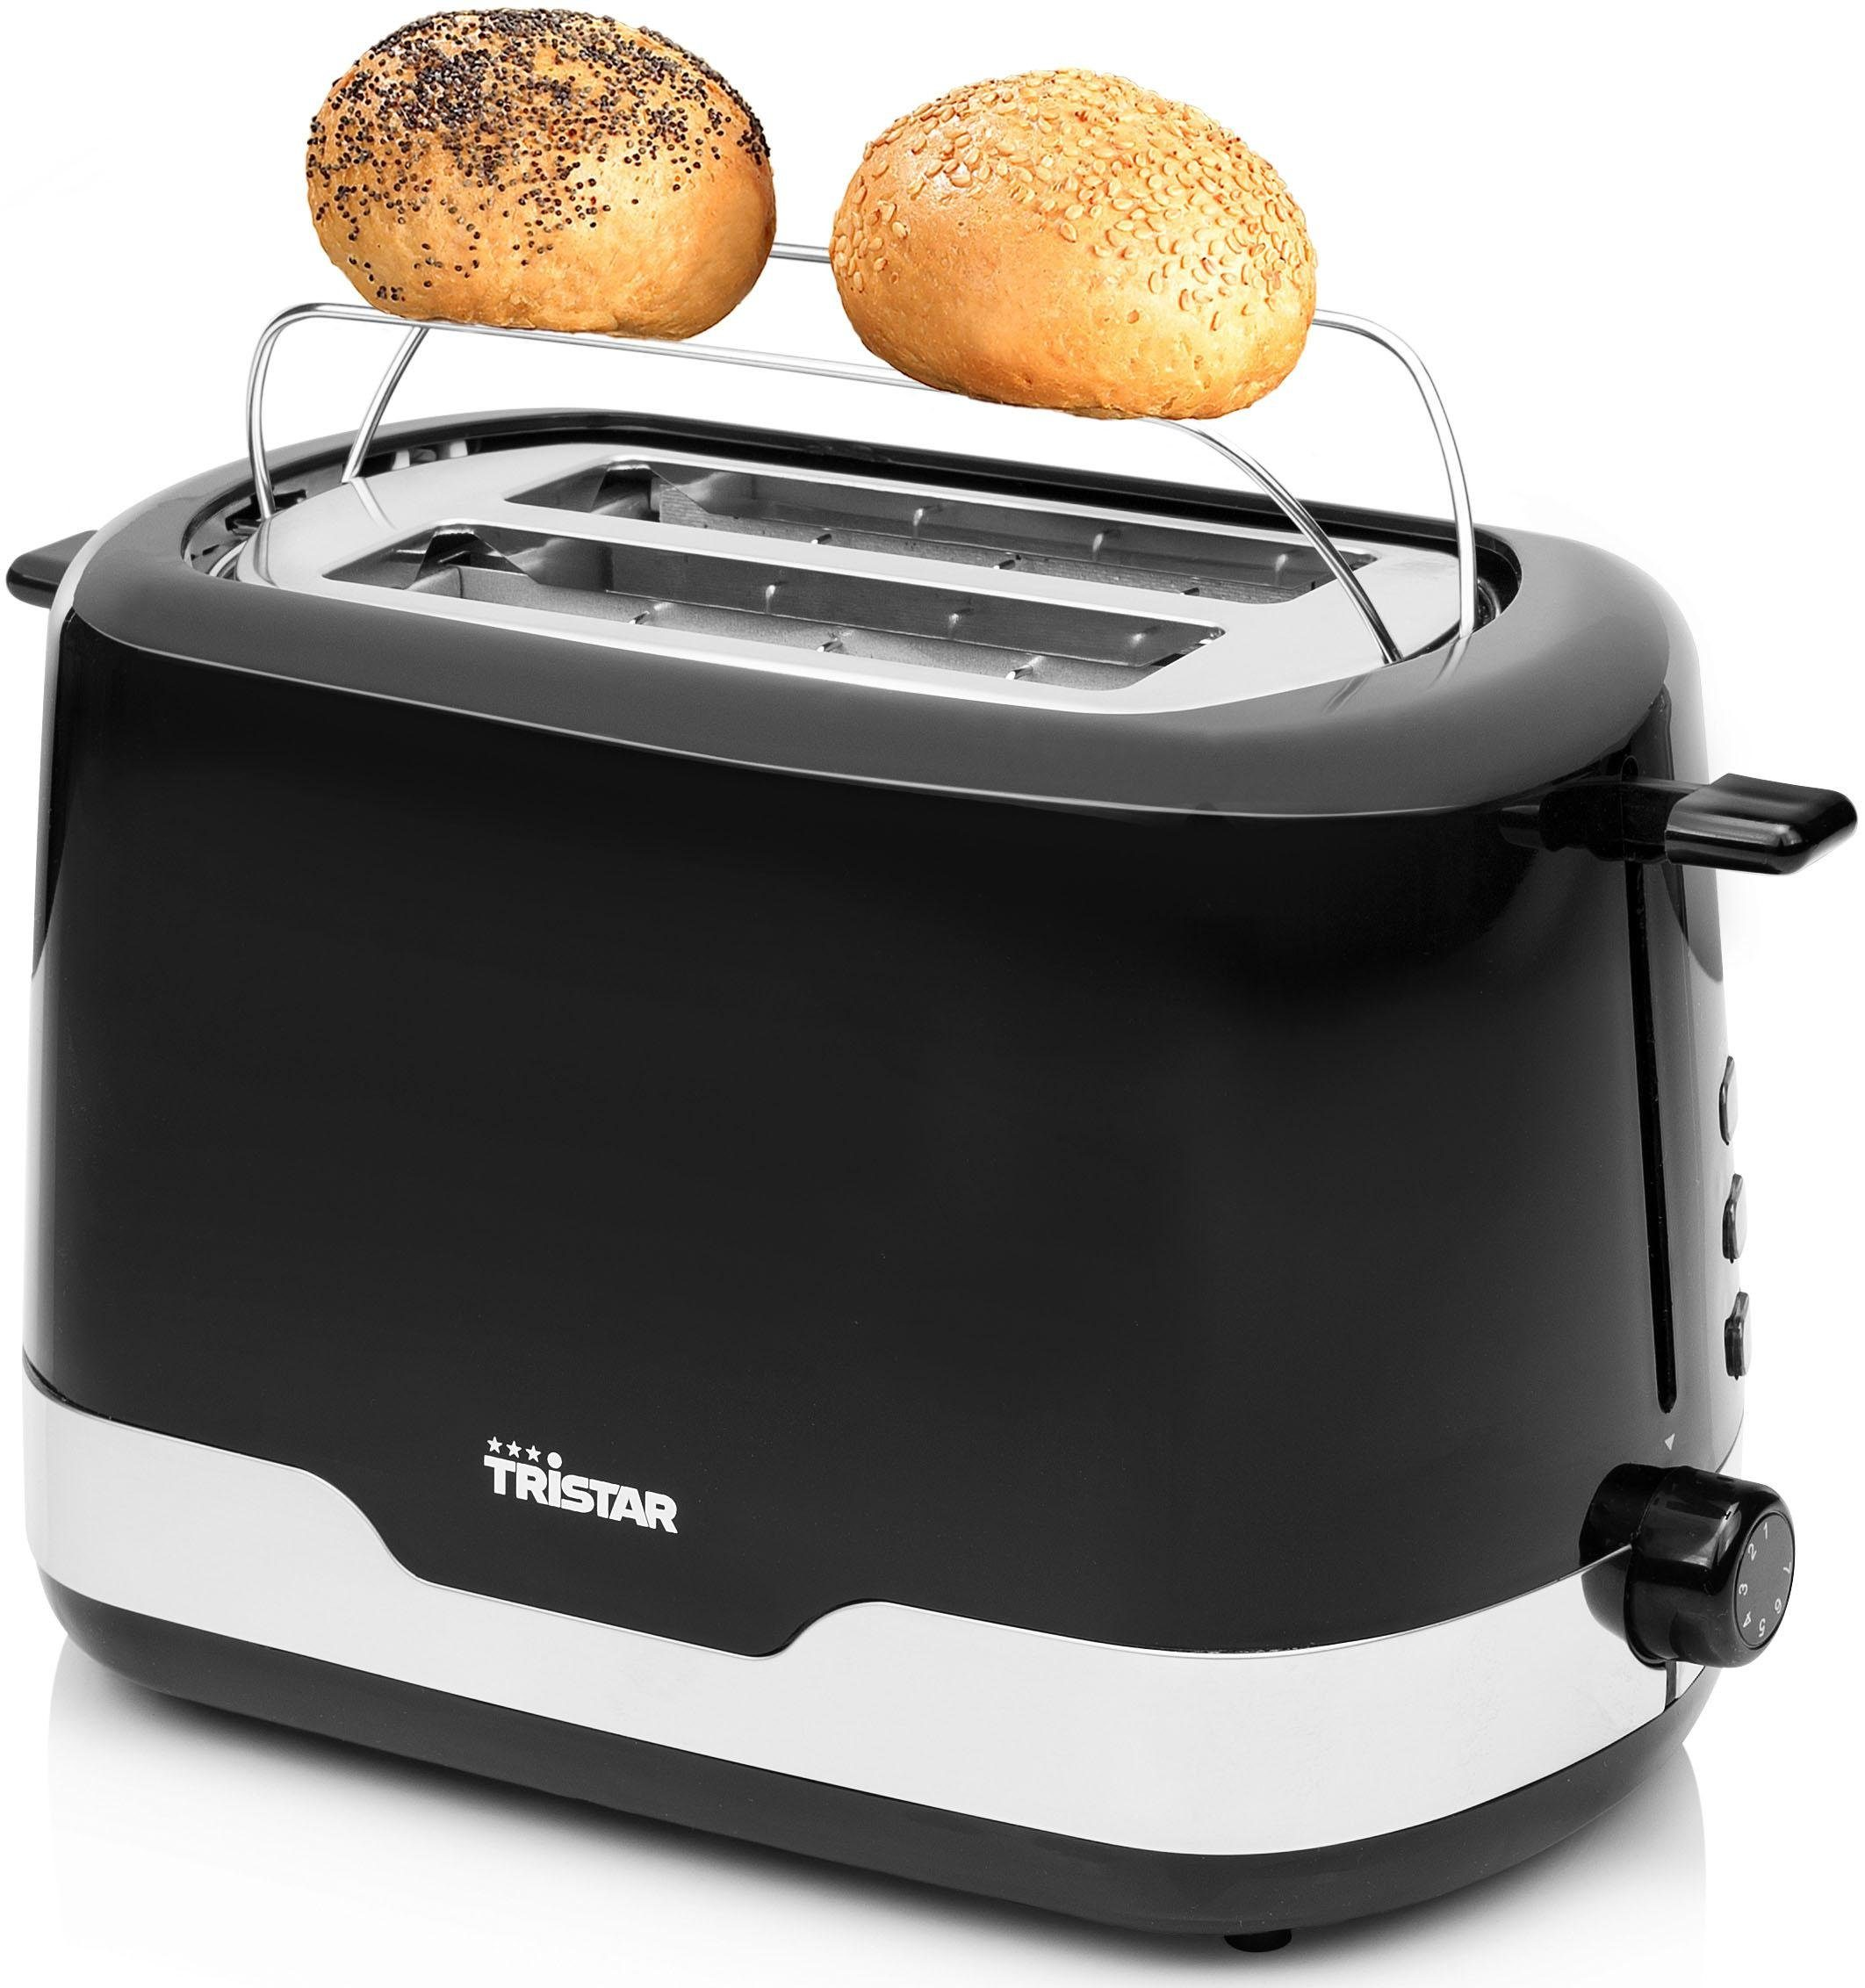 Tristar Toaster BR-1042, mit Edelstahlakzenten, 850 Watt